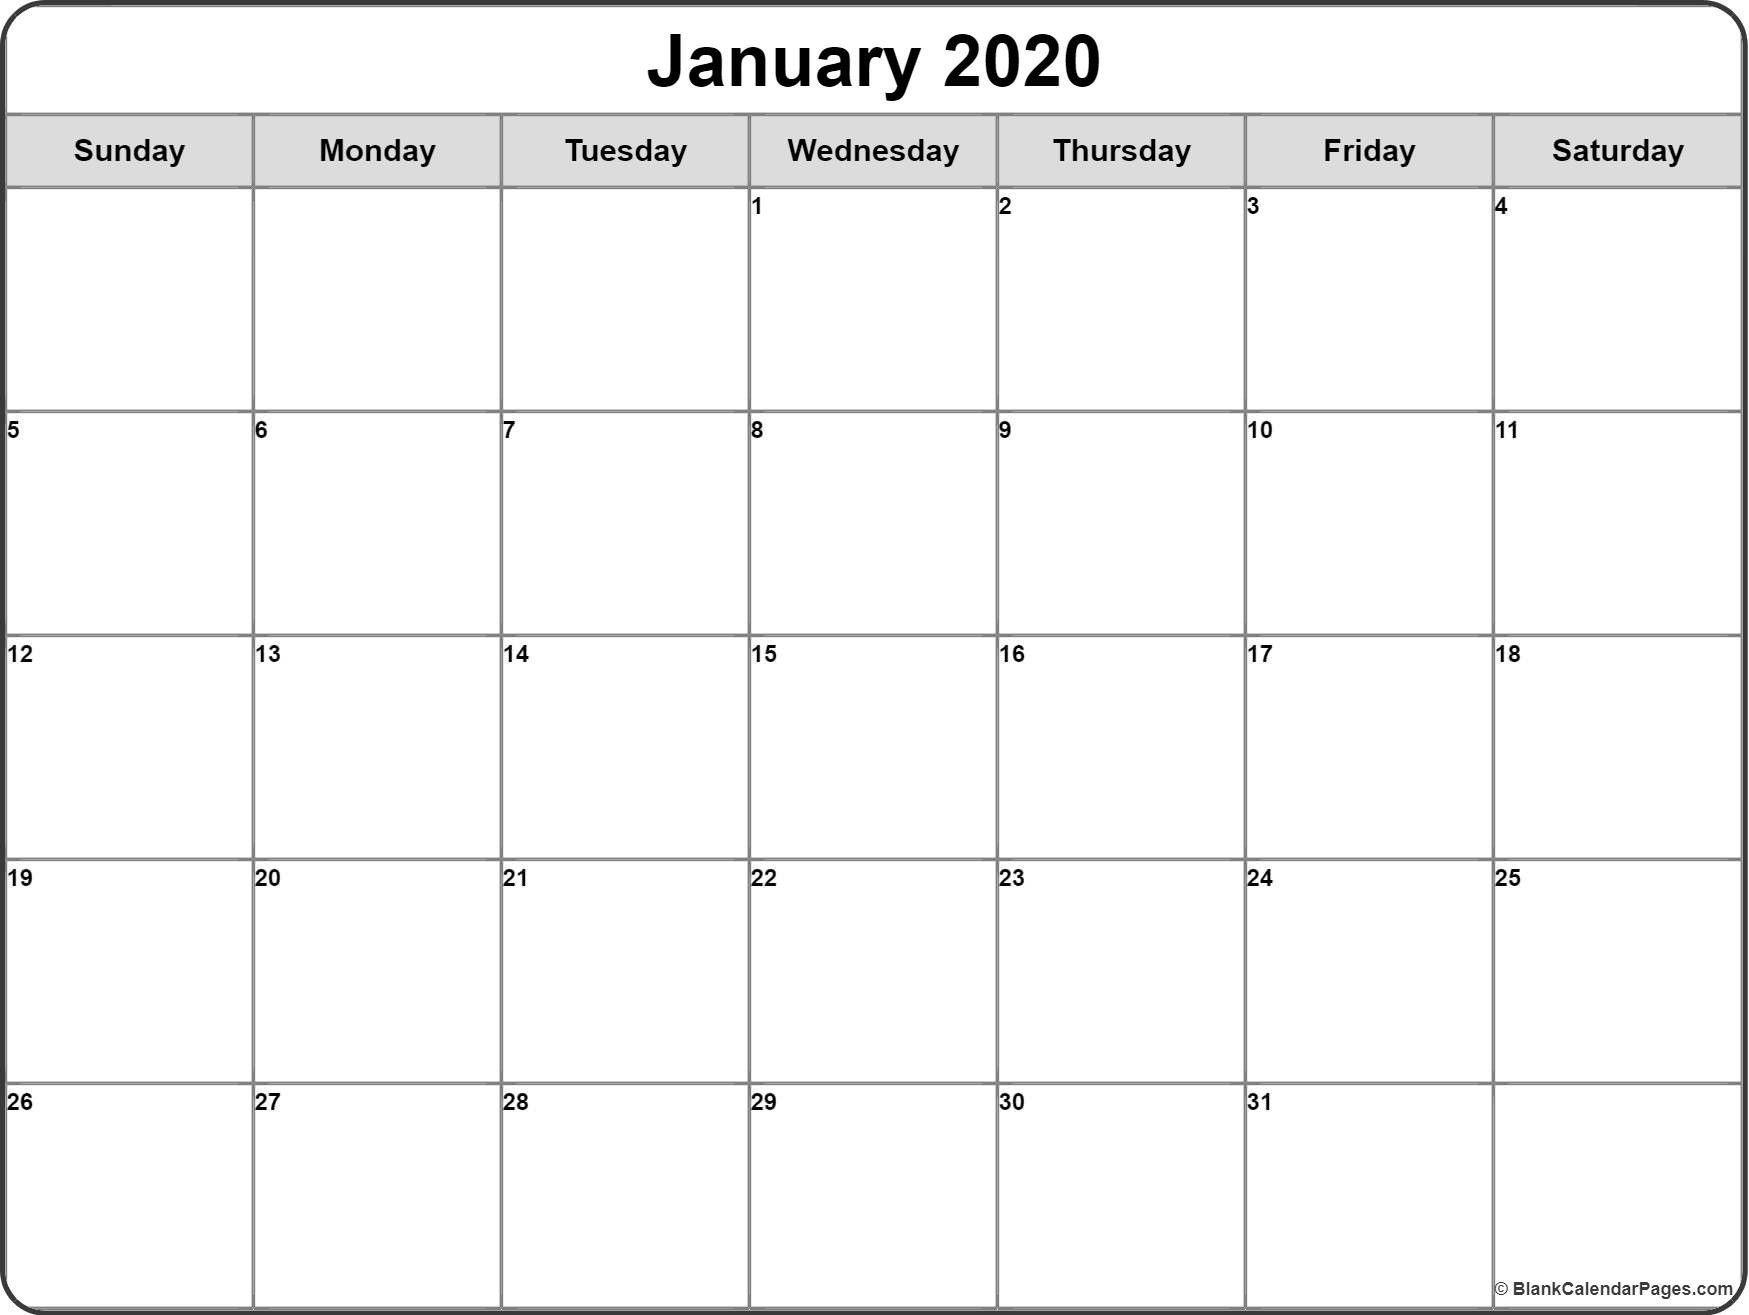 Pinjessie Phillips On My Saves In 2020 | Free Printable